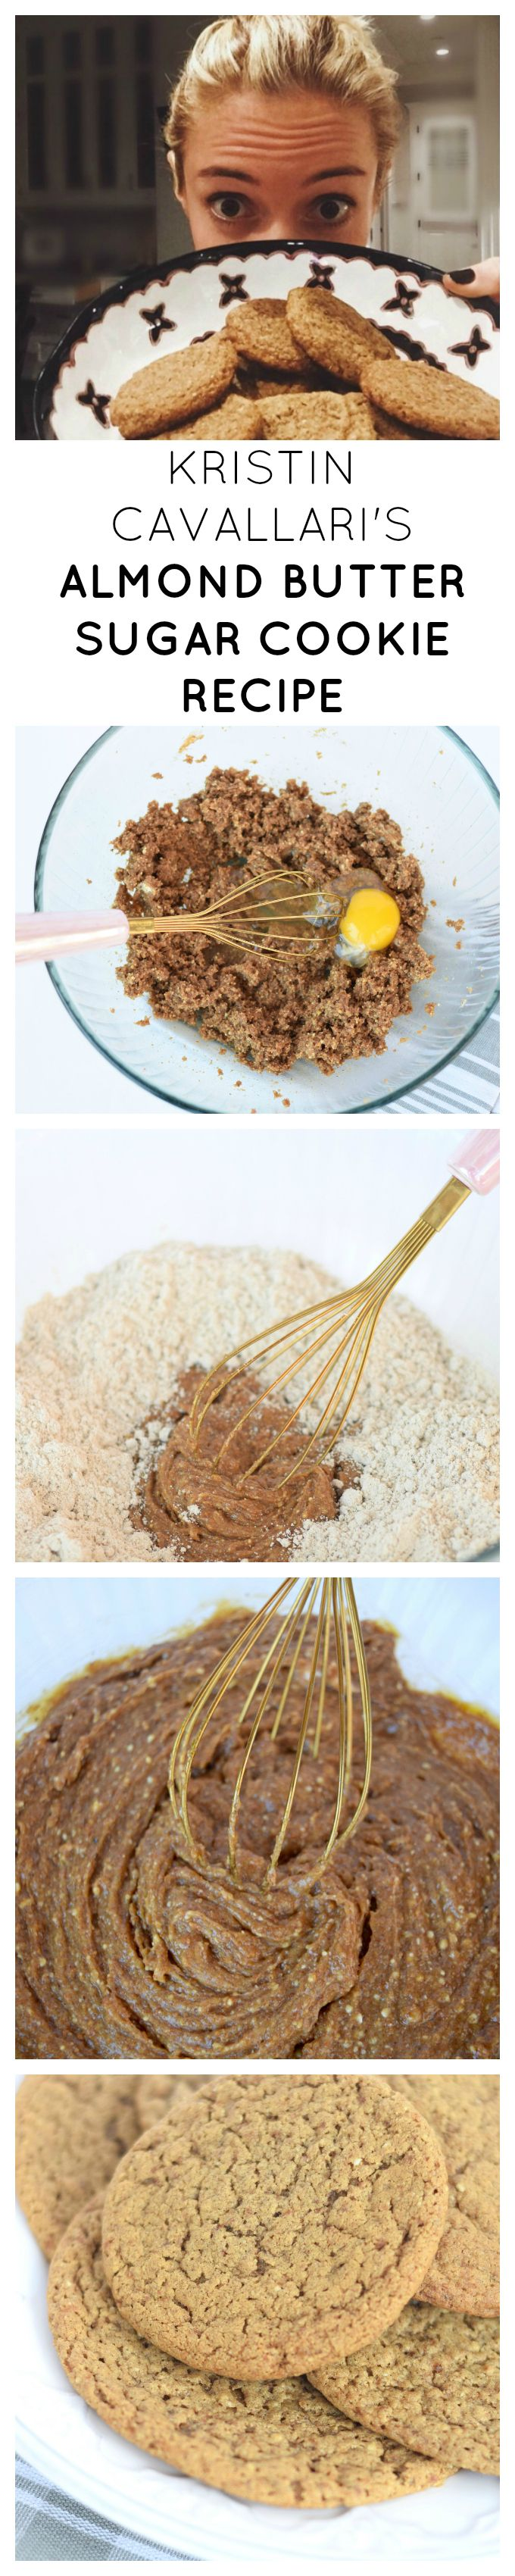 Kristin Cavallari's Almond Butter Sugar Cookie Recipe (Healthy Christmas Recipes)